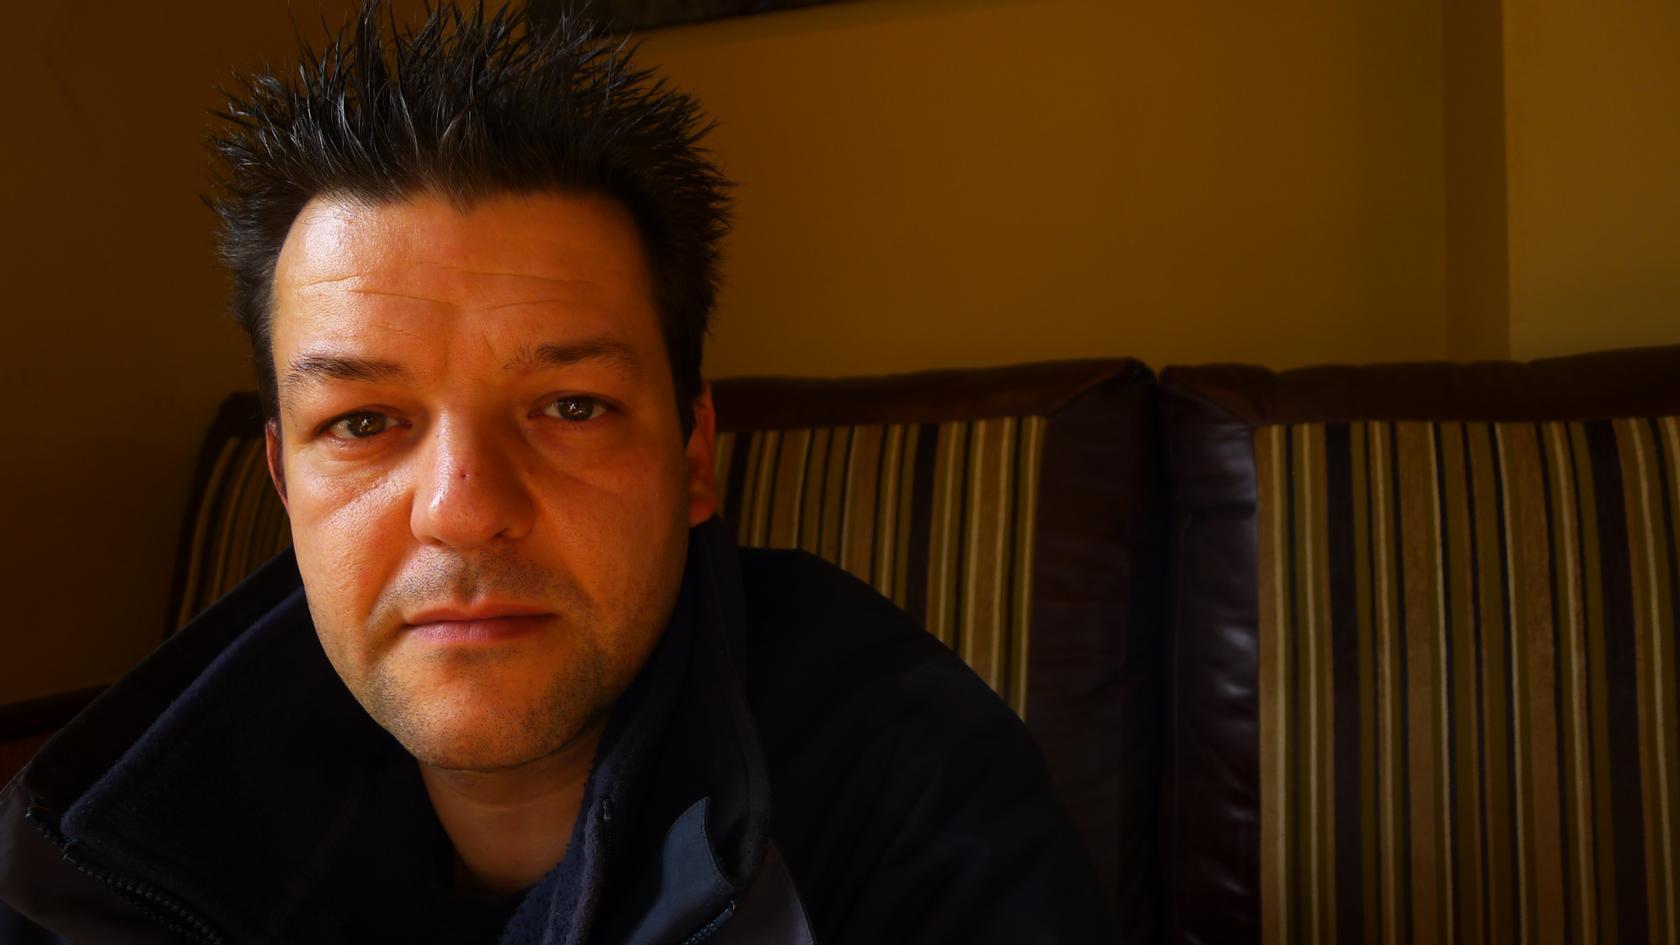 Adrian Snood